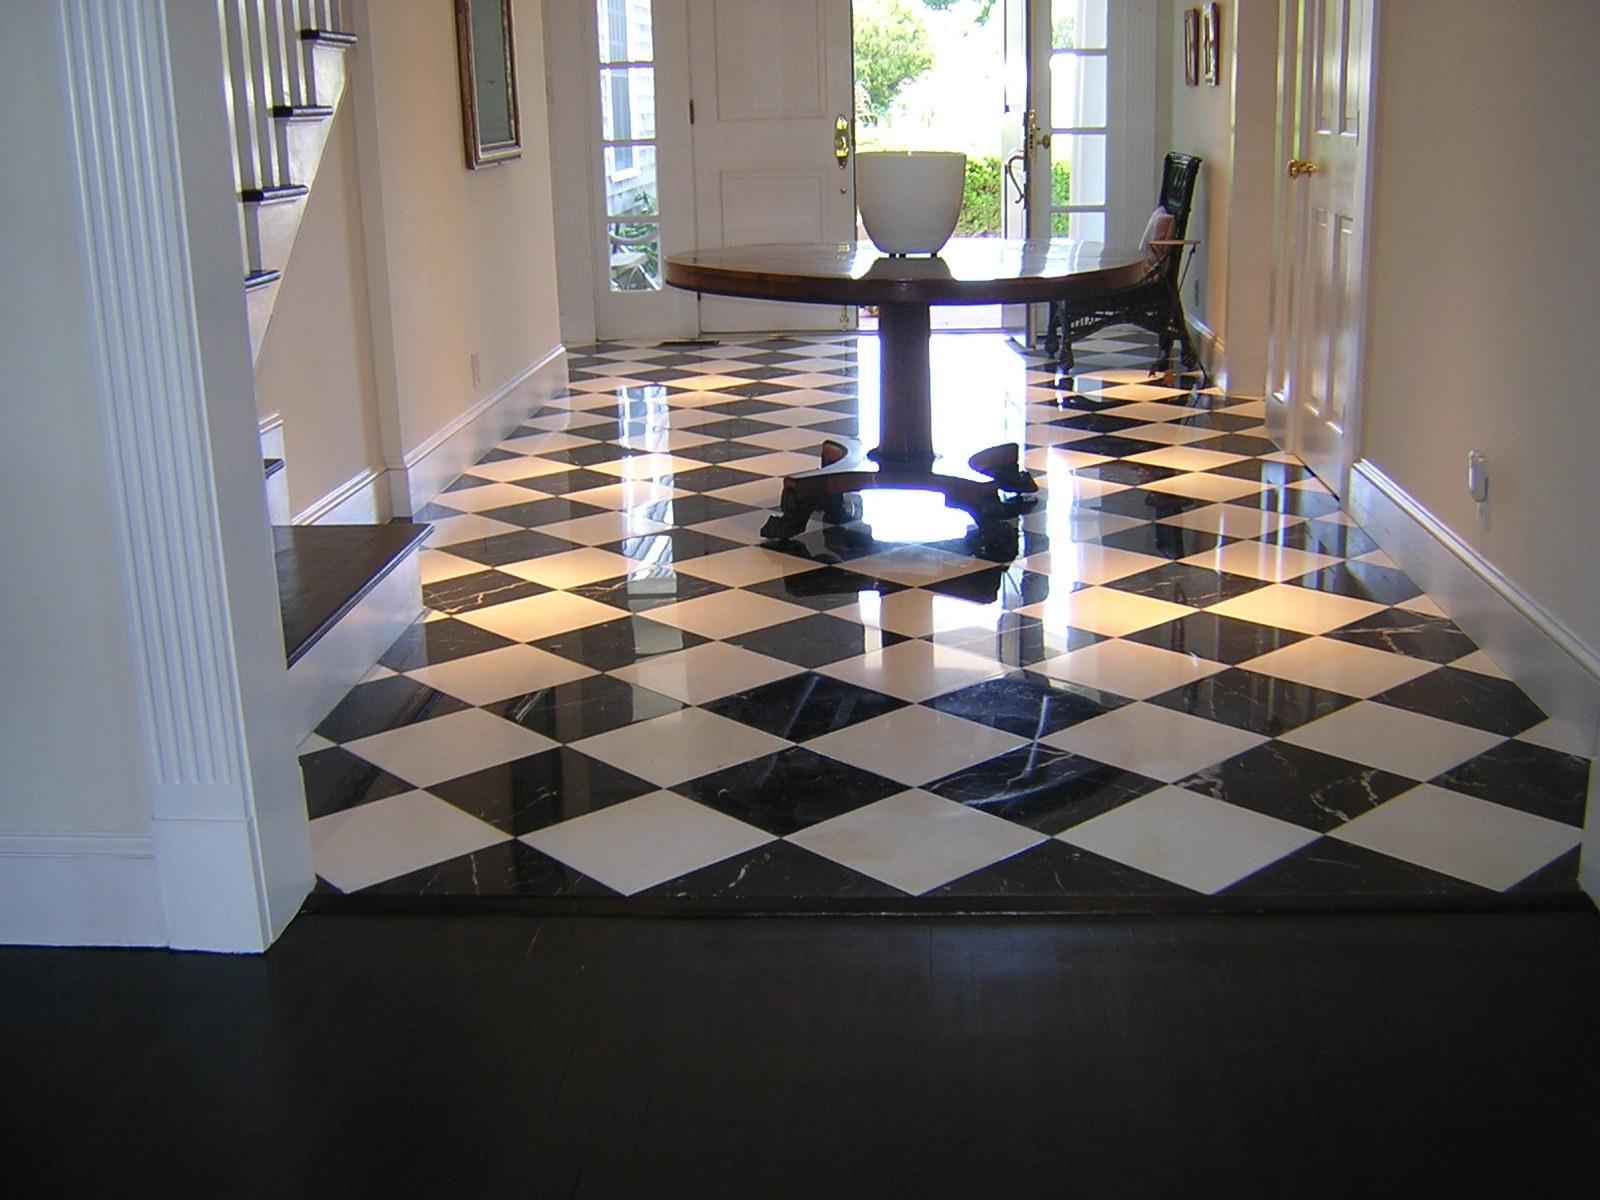 Stylish Floors N' More Inc image 4